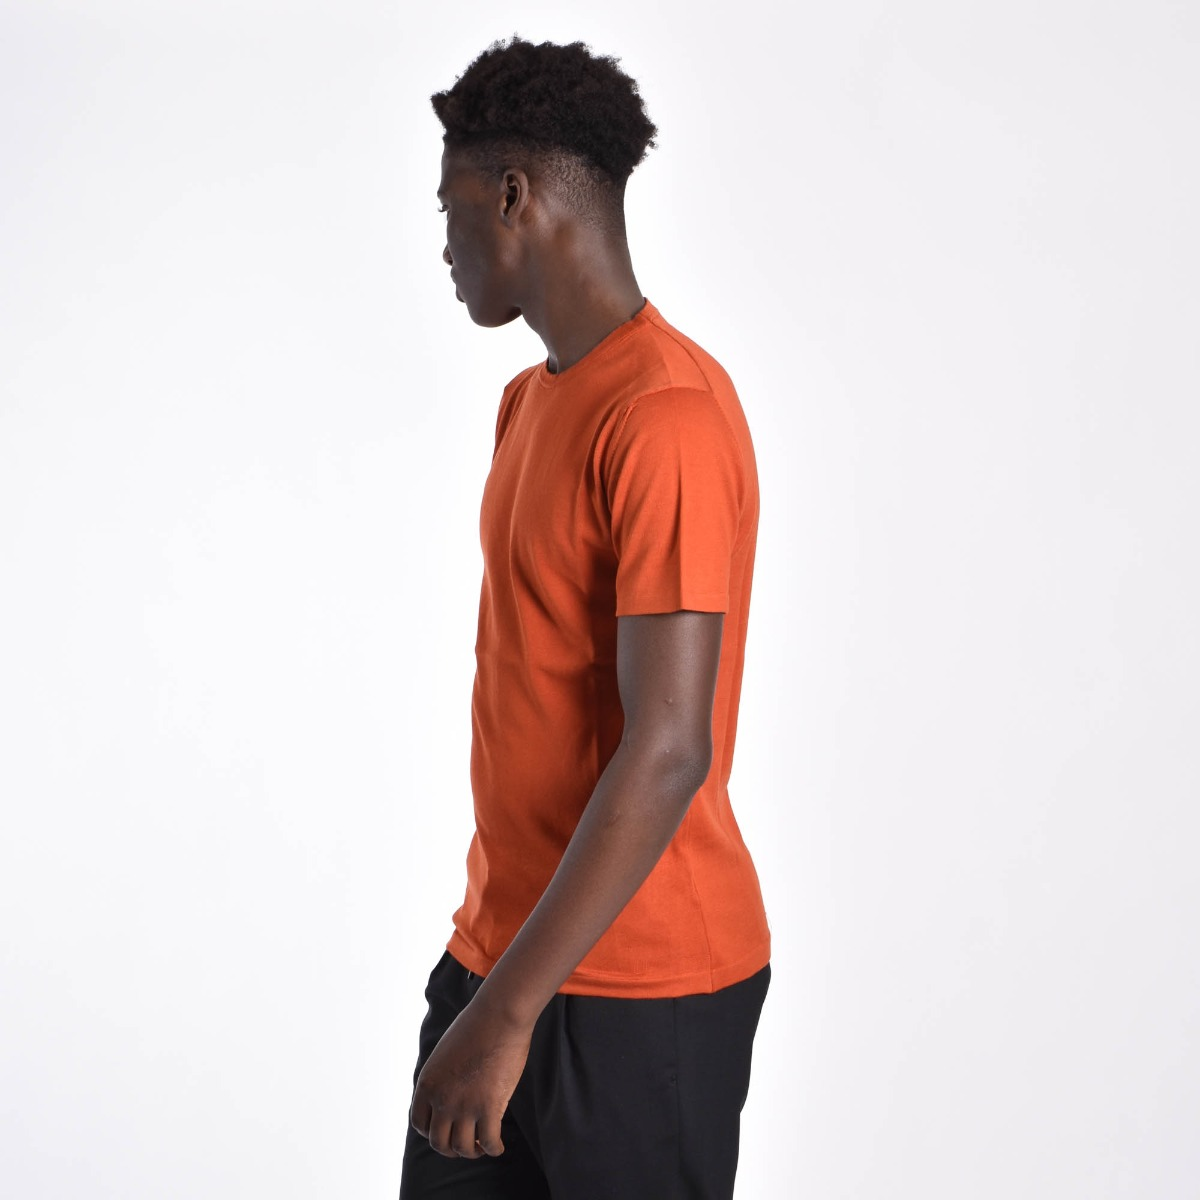 T-shirt in filo - Arancio